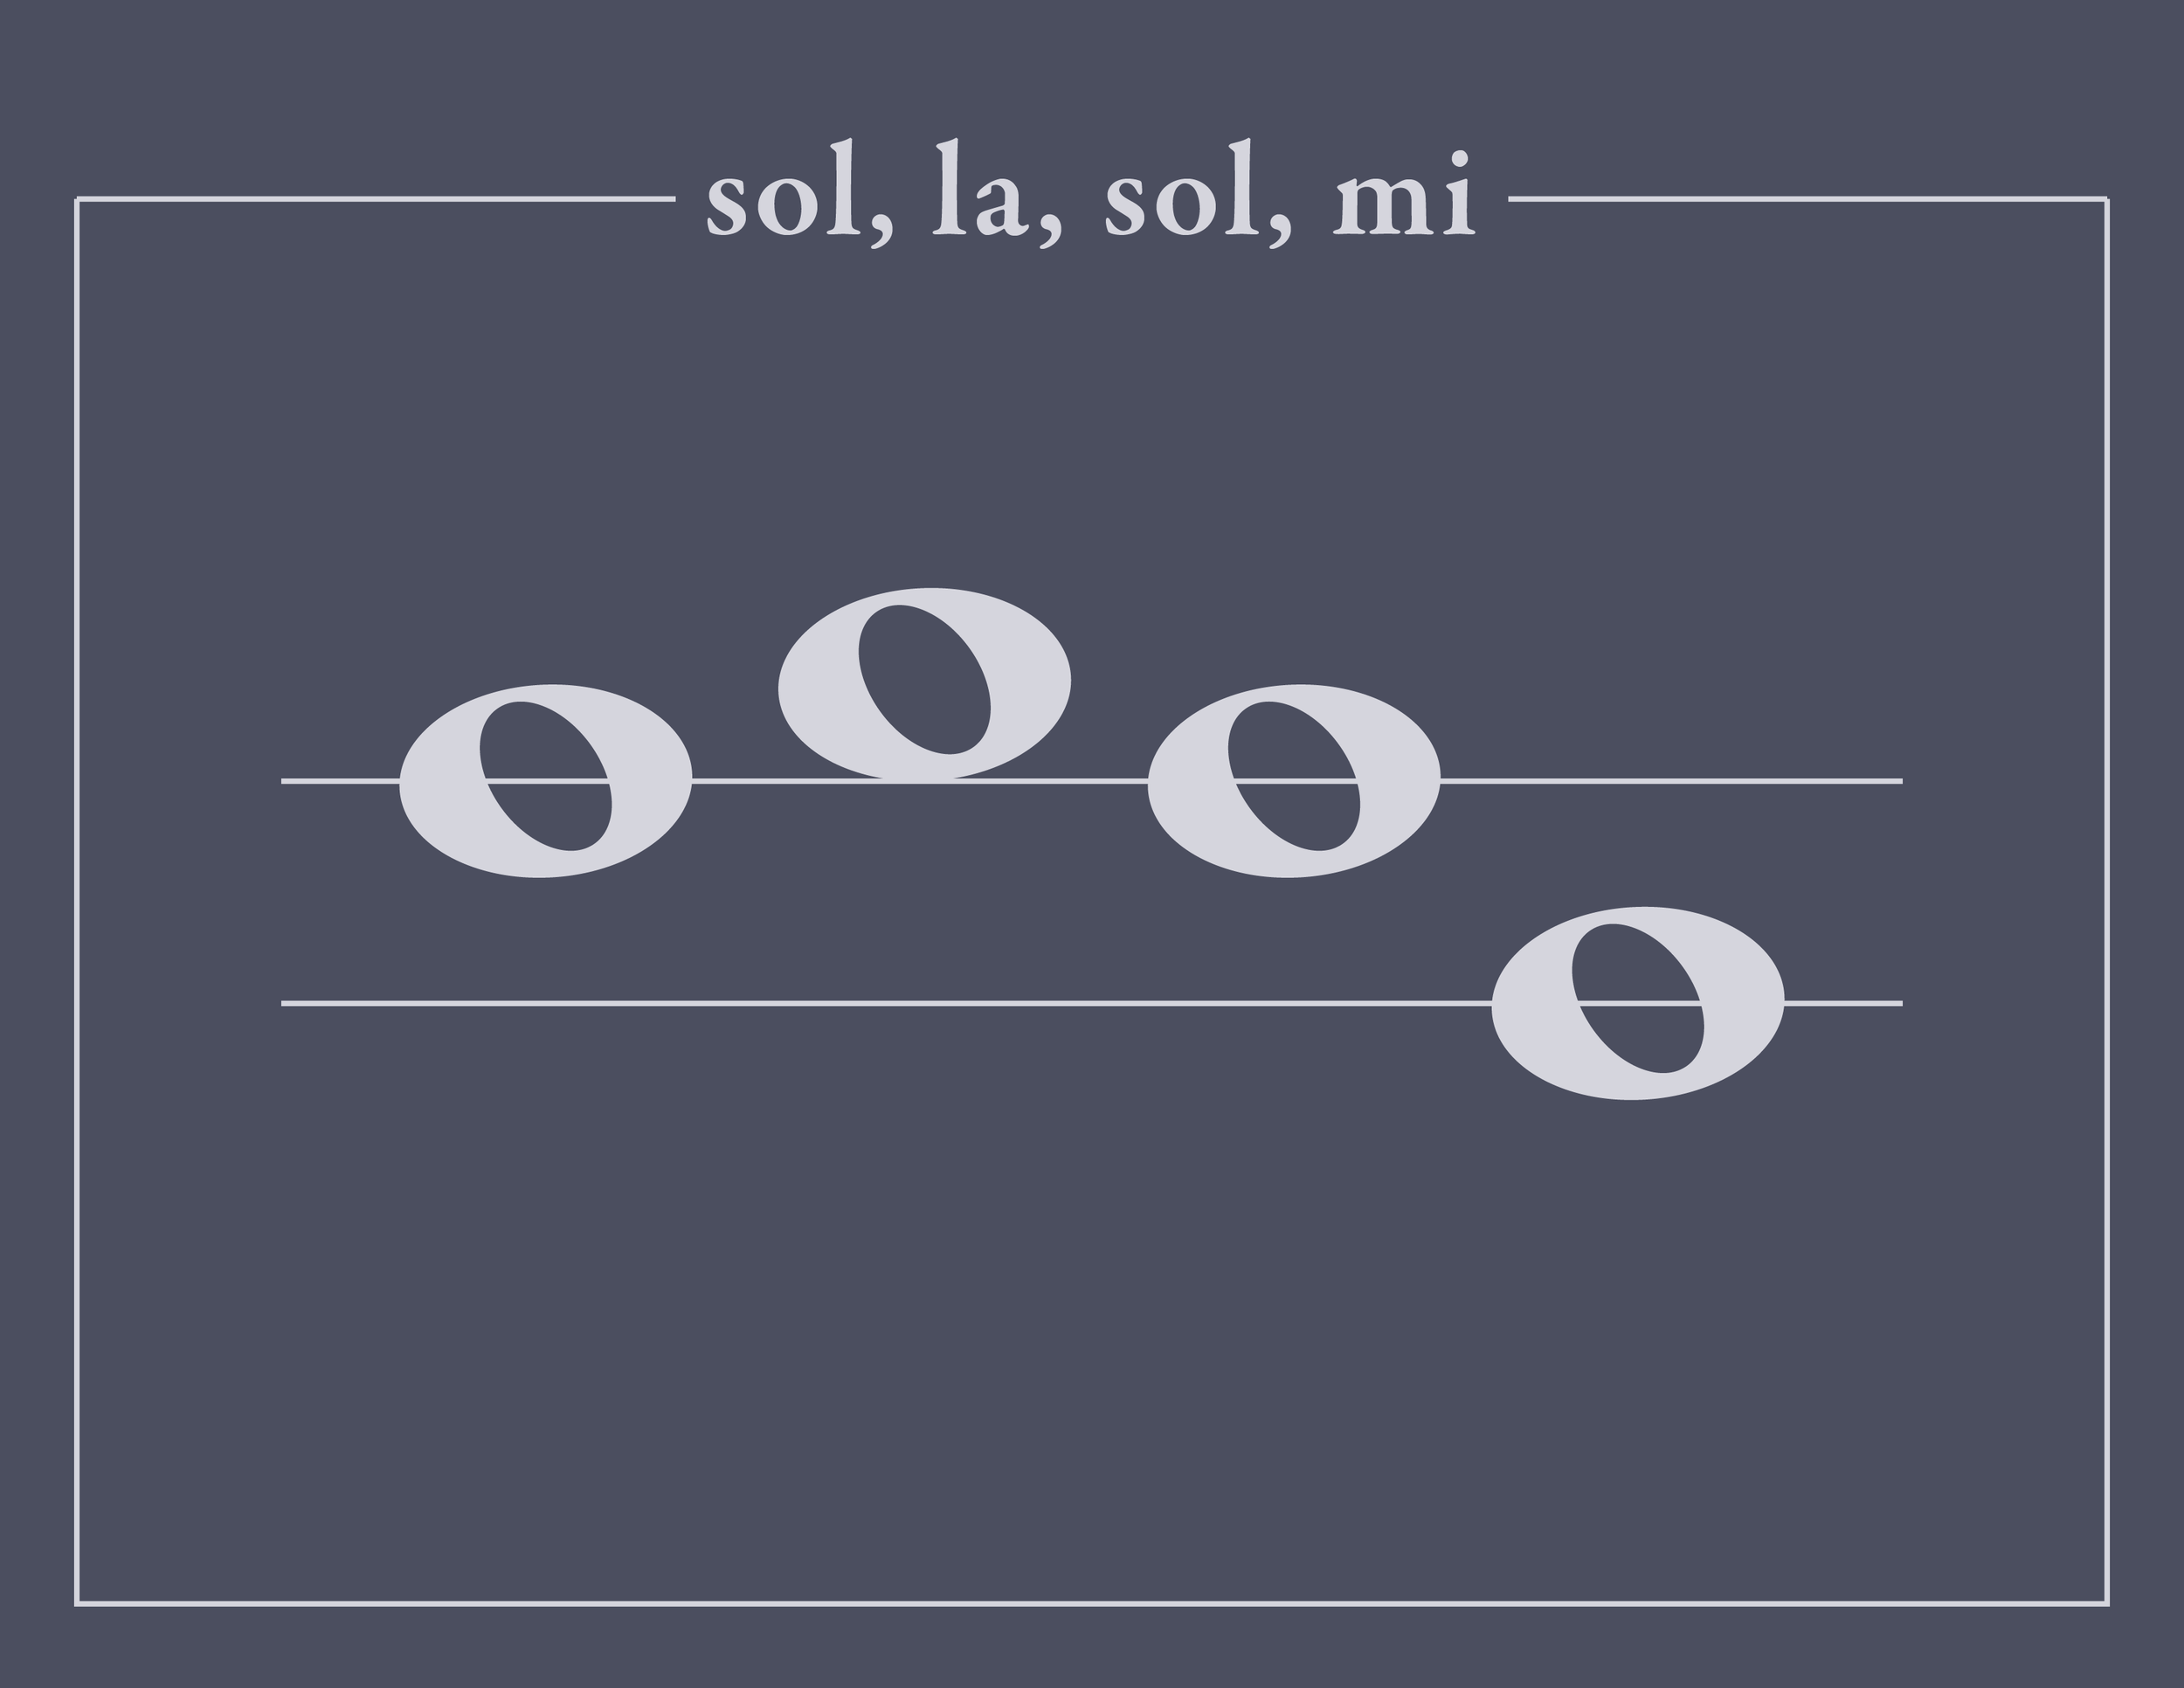 Sheet Music Library Cards Full_Sol La Sol Mi.png